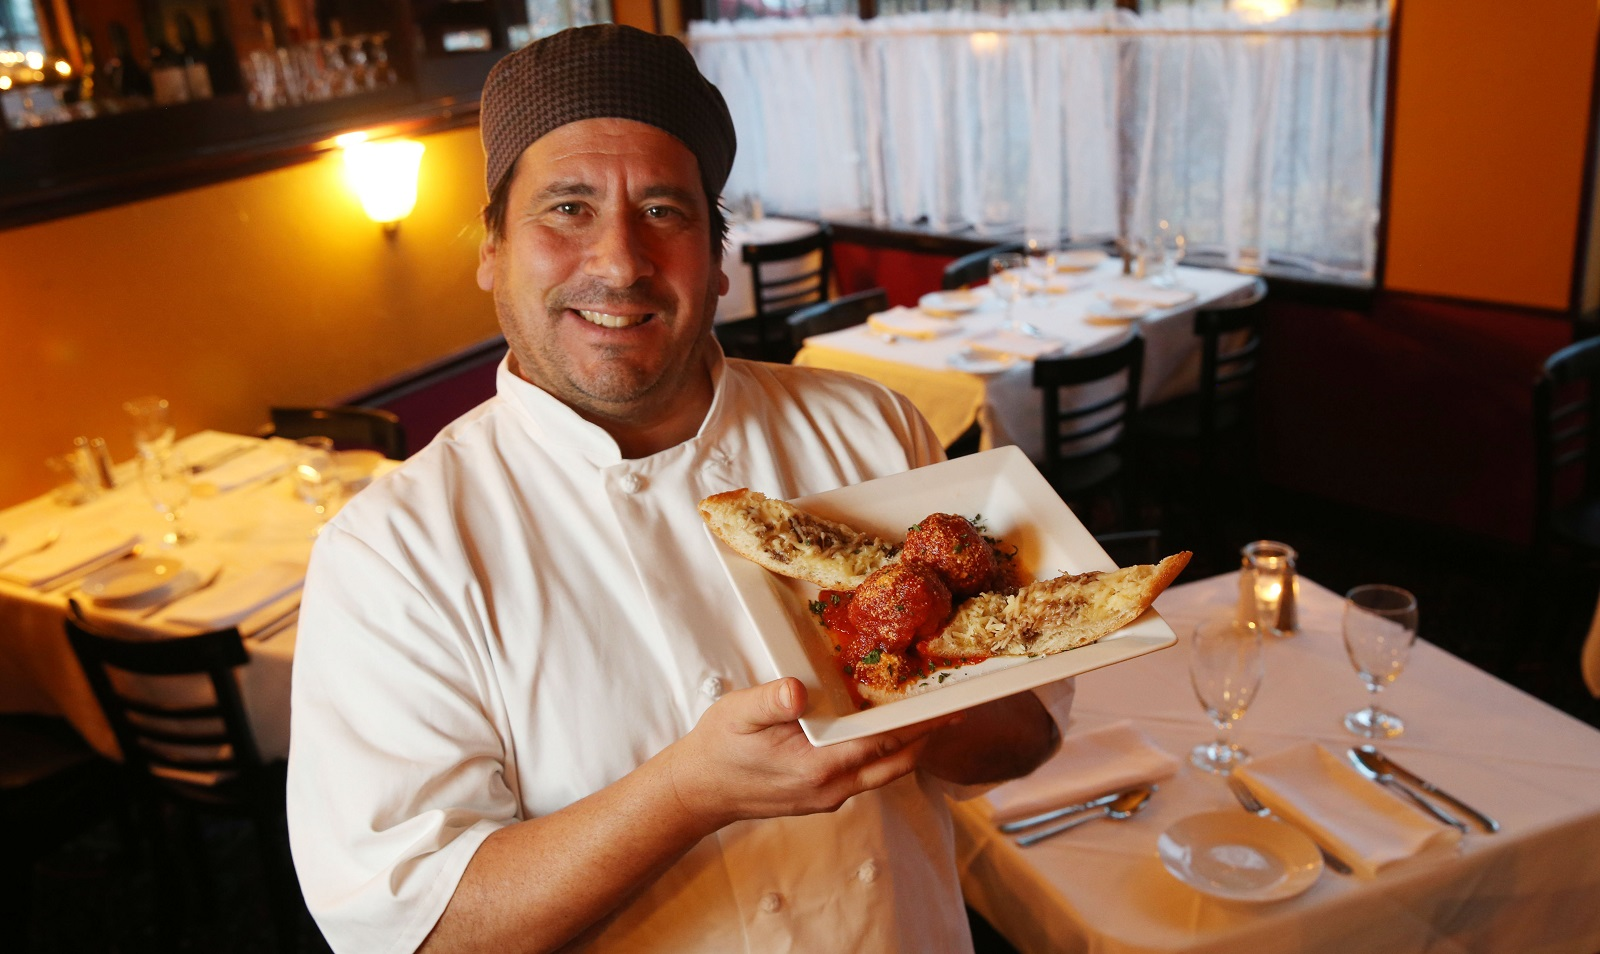 Bellini's Bistro owner and chef Mike Navarro presents the tomato braise polpette. (Sharon Cantillon/Buffalo News)